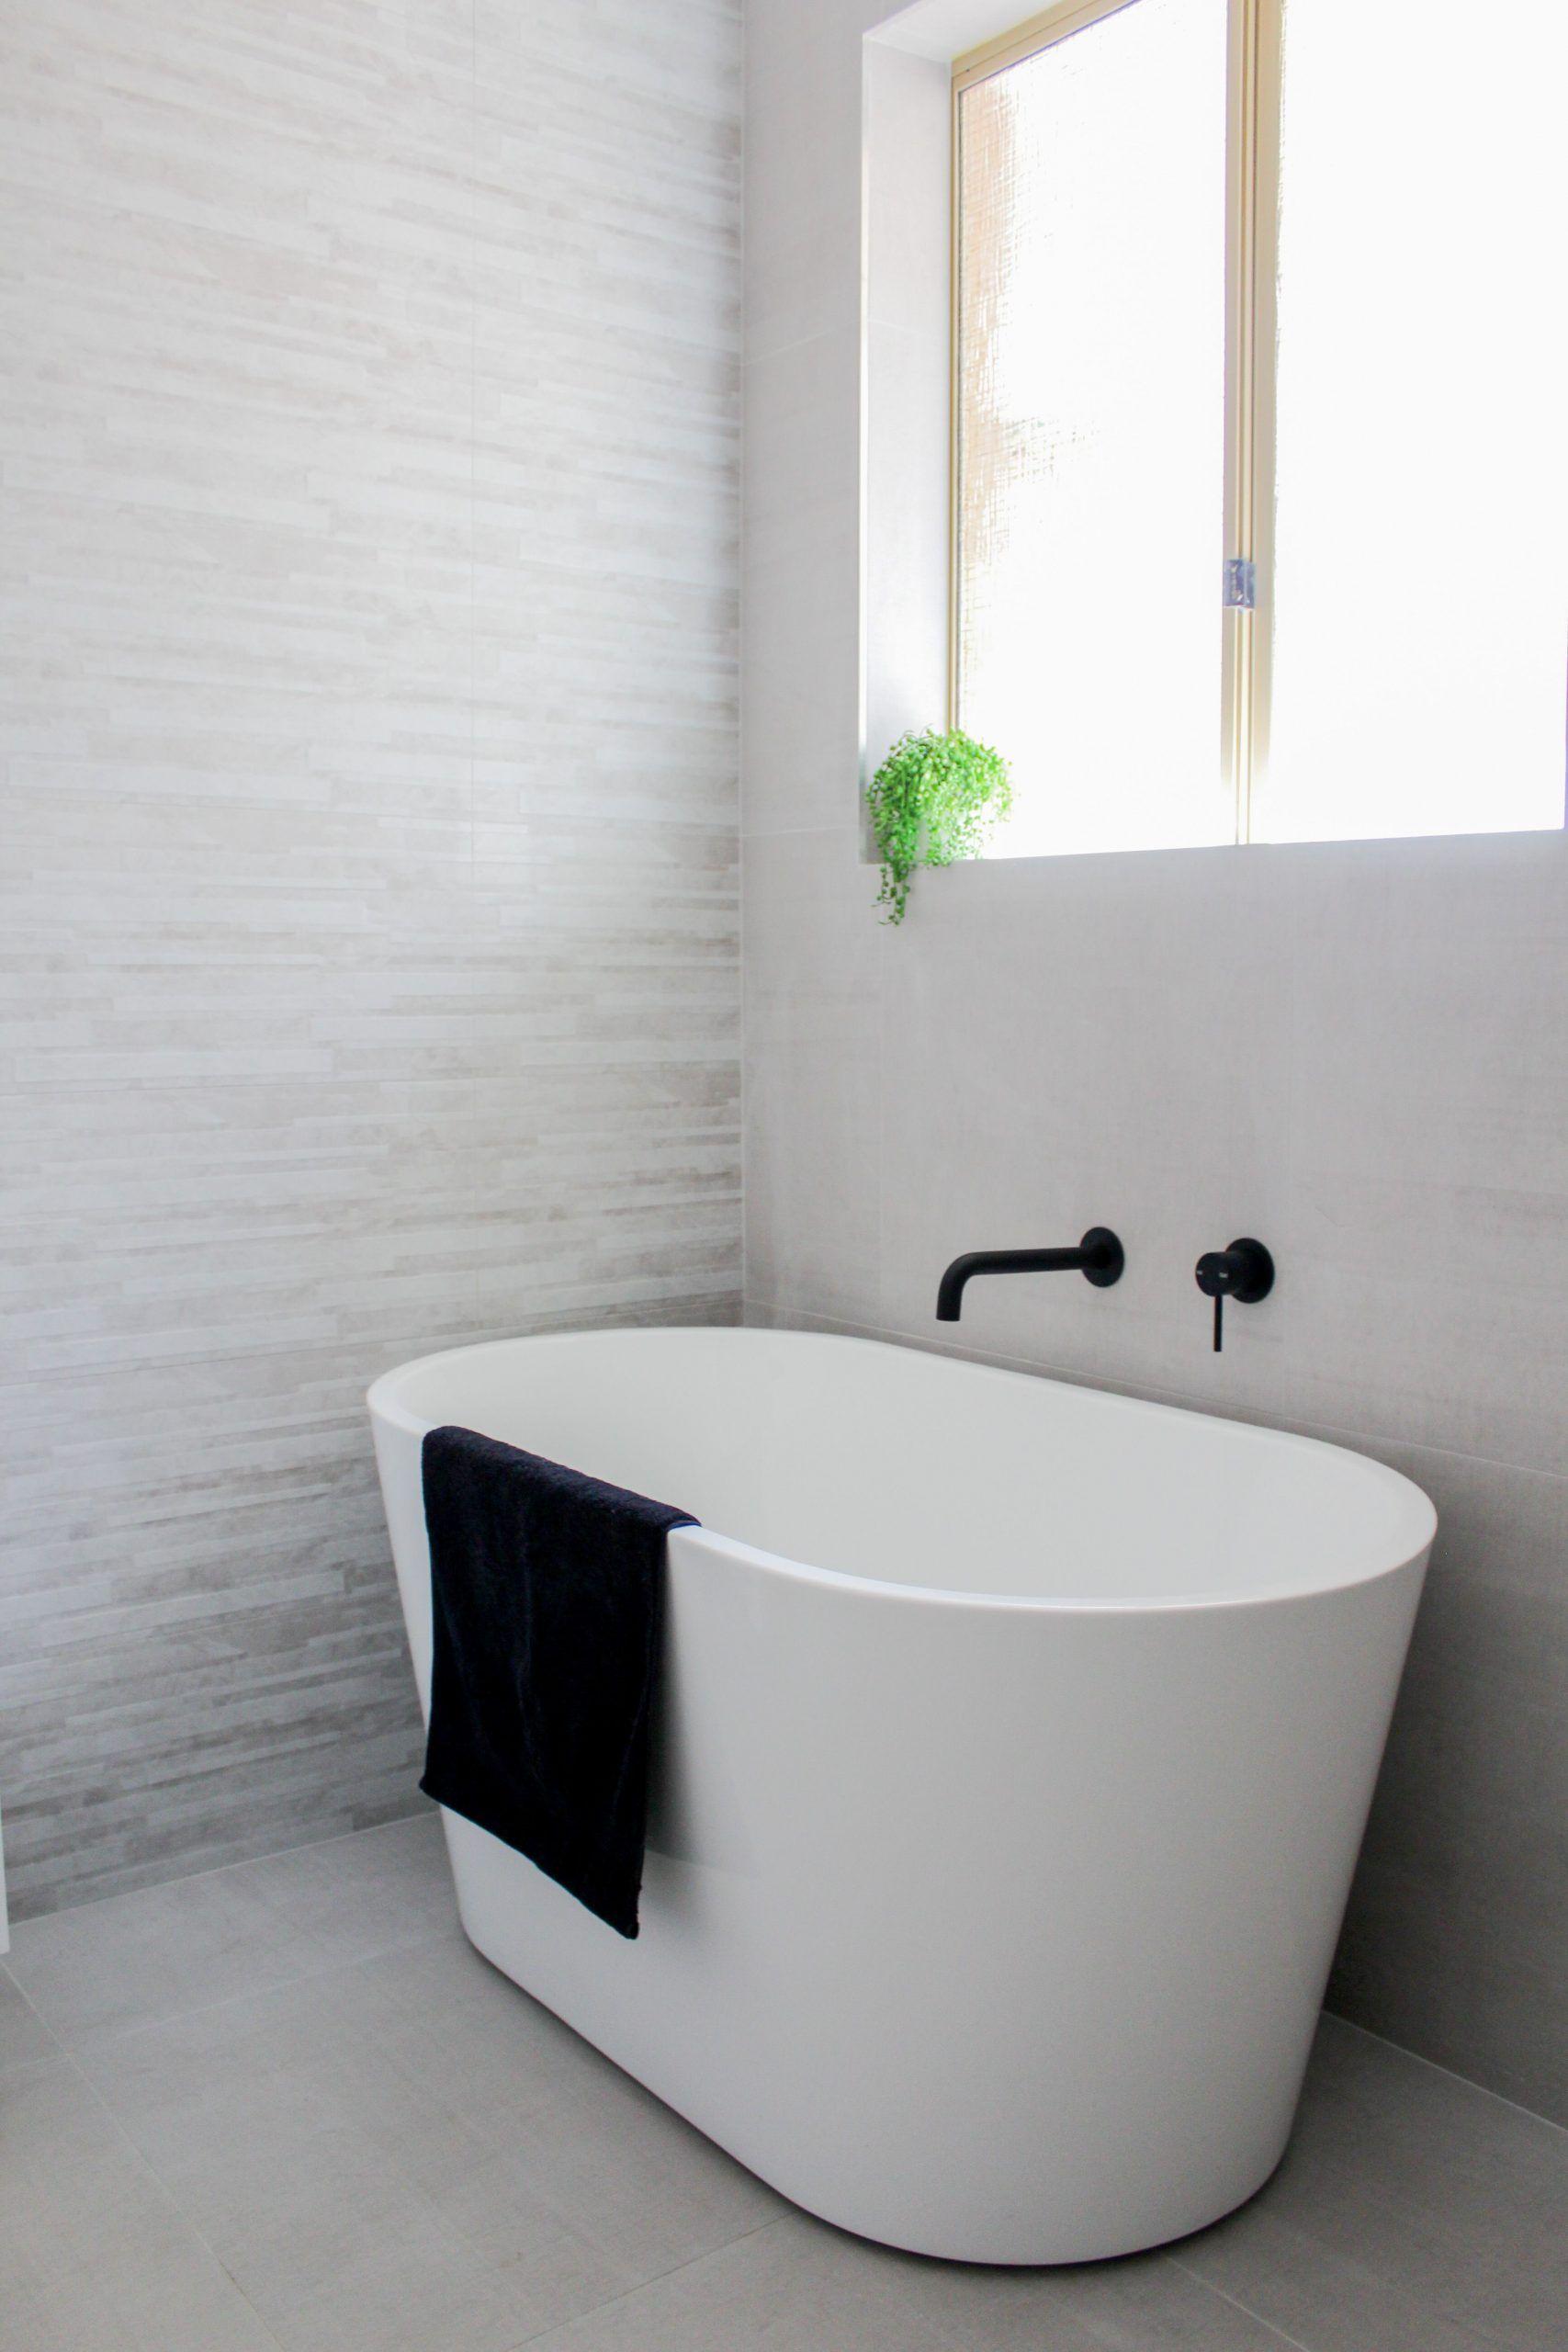 1200mm Freestanding Bath 1200mm Bath Freestanding In 2020 Best Bathroom Designs Amazing Bathrooms Bathroom Design